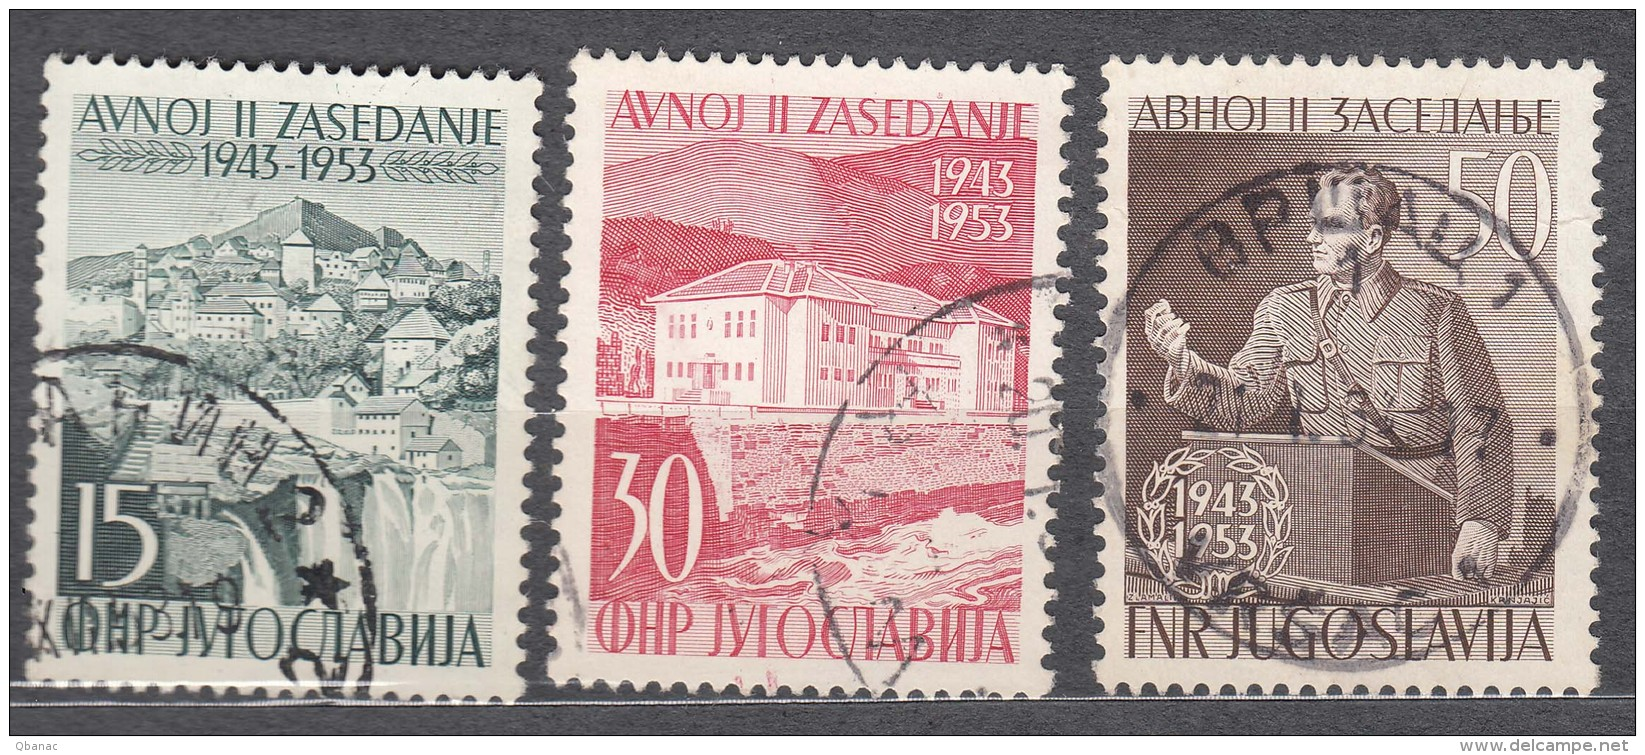 Yugoslavia Republic 1953 Tito Mi#735-737 Used - 1945-1992 Socialistische Federale Republiek Joegoslavië